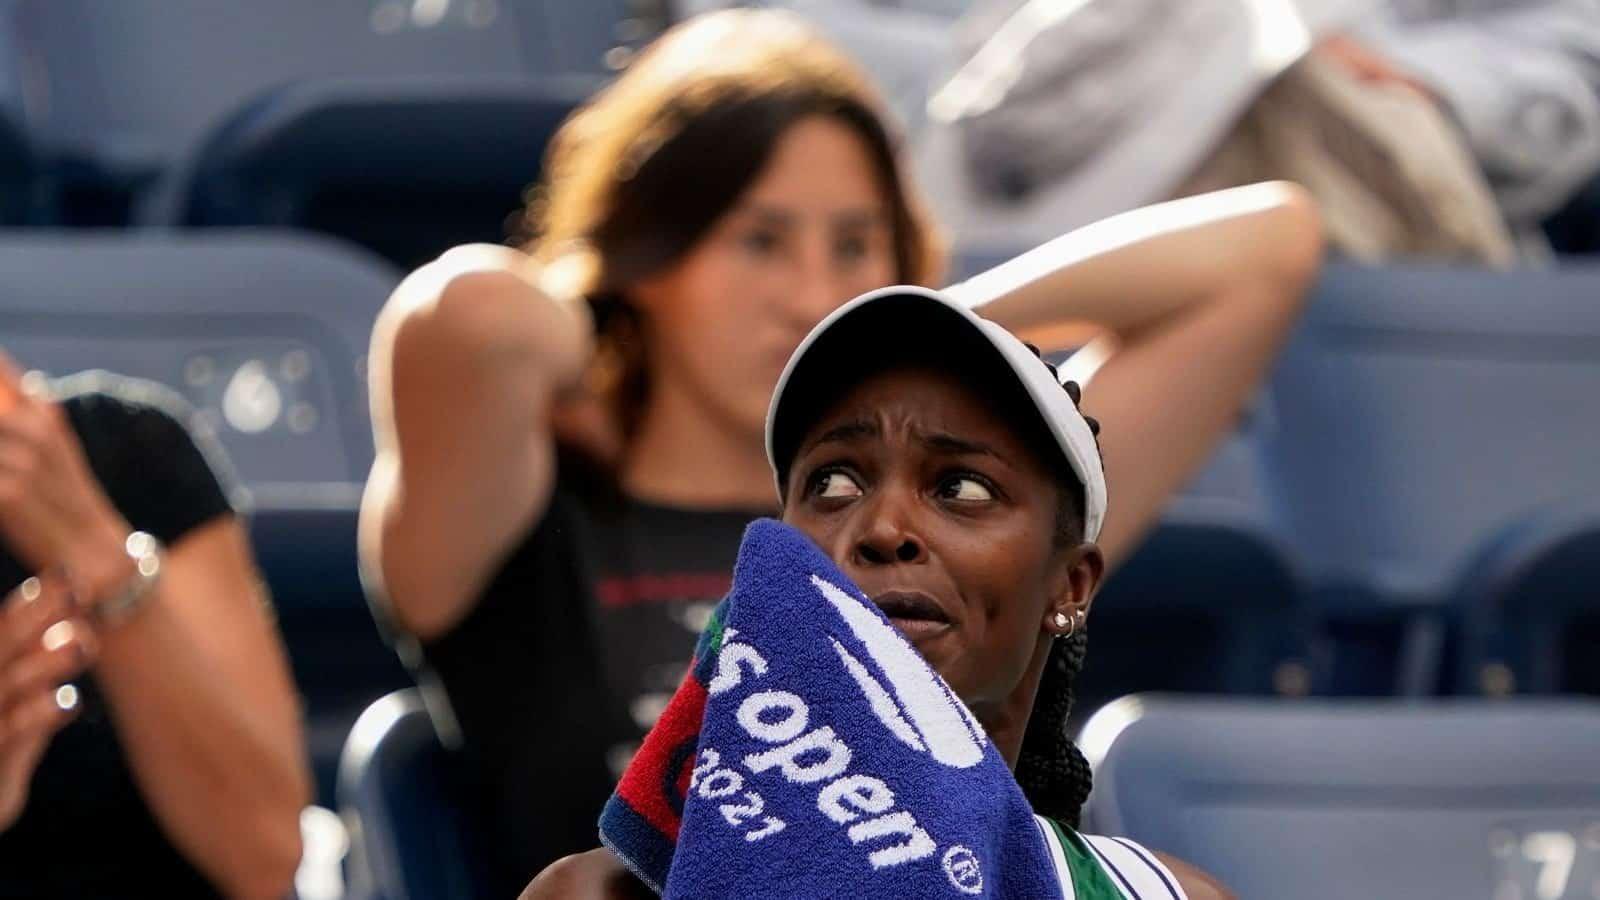 La ex campeona del US Open Sloane Stephens comparte publicaciones